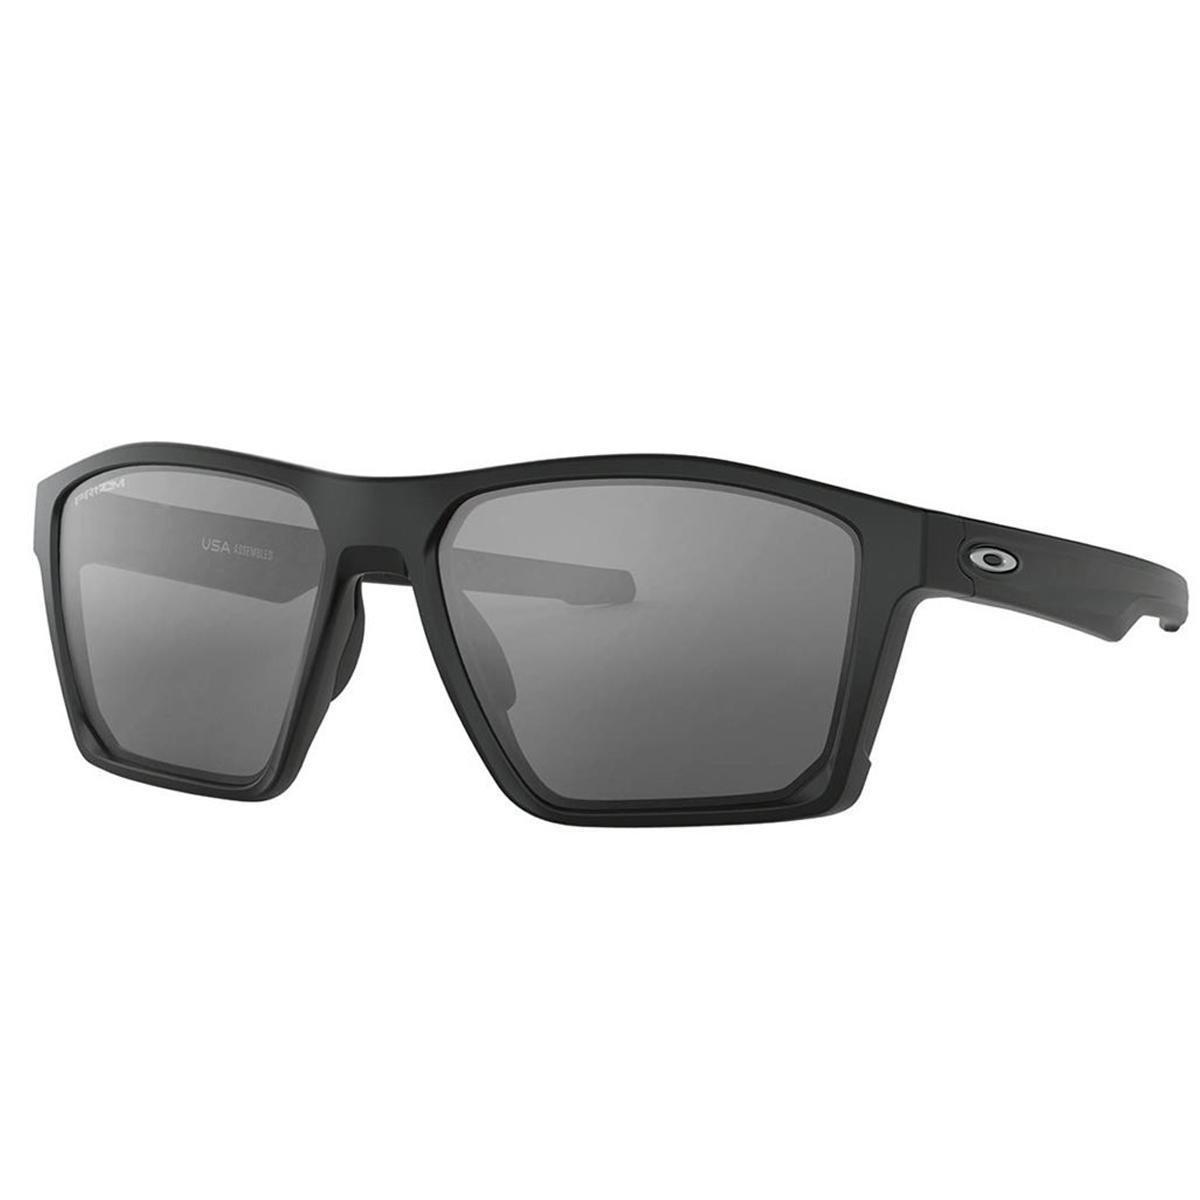 06d21b24cb1e5 Óculos Oakley Targetline Matte Black   Prizm Black - Preto - Compre Agora